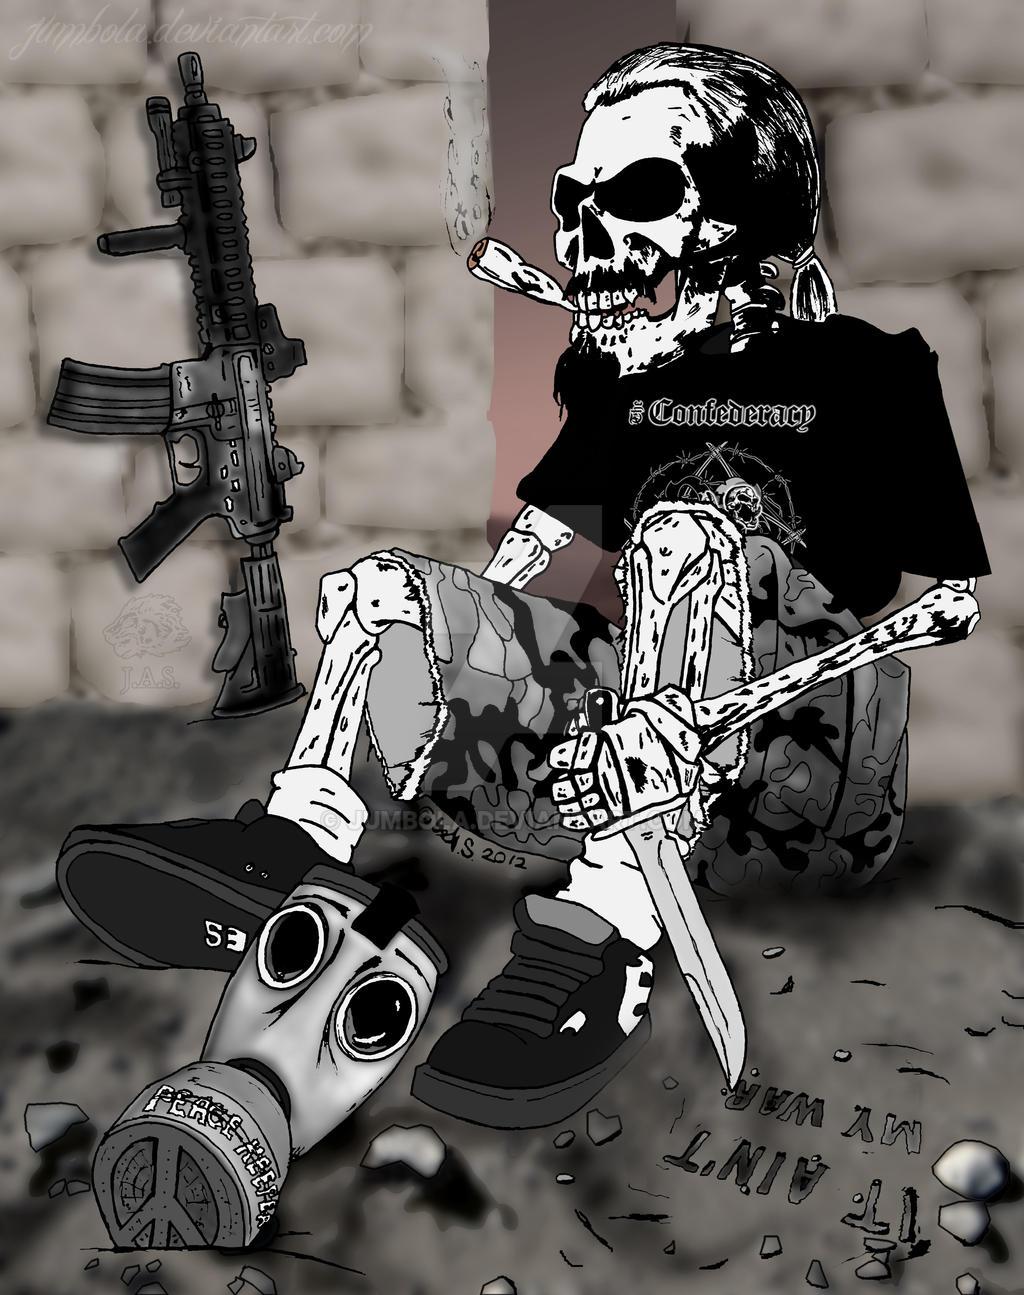 It Ain't My War by JUMBOLA